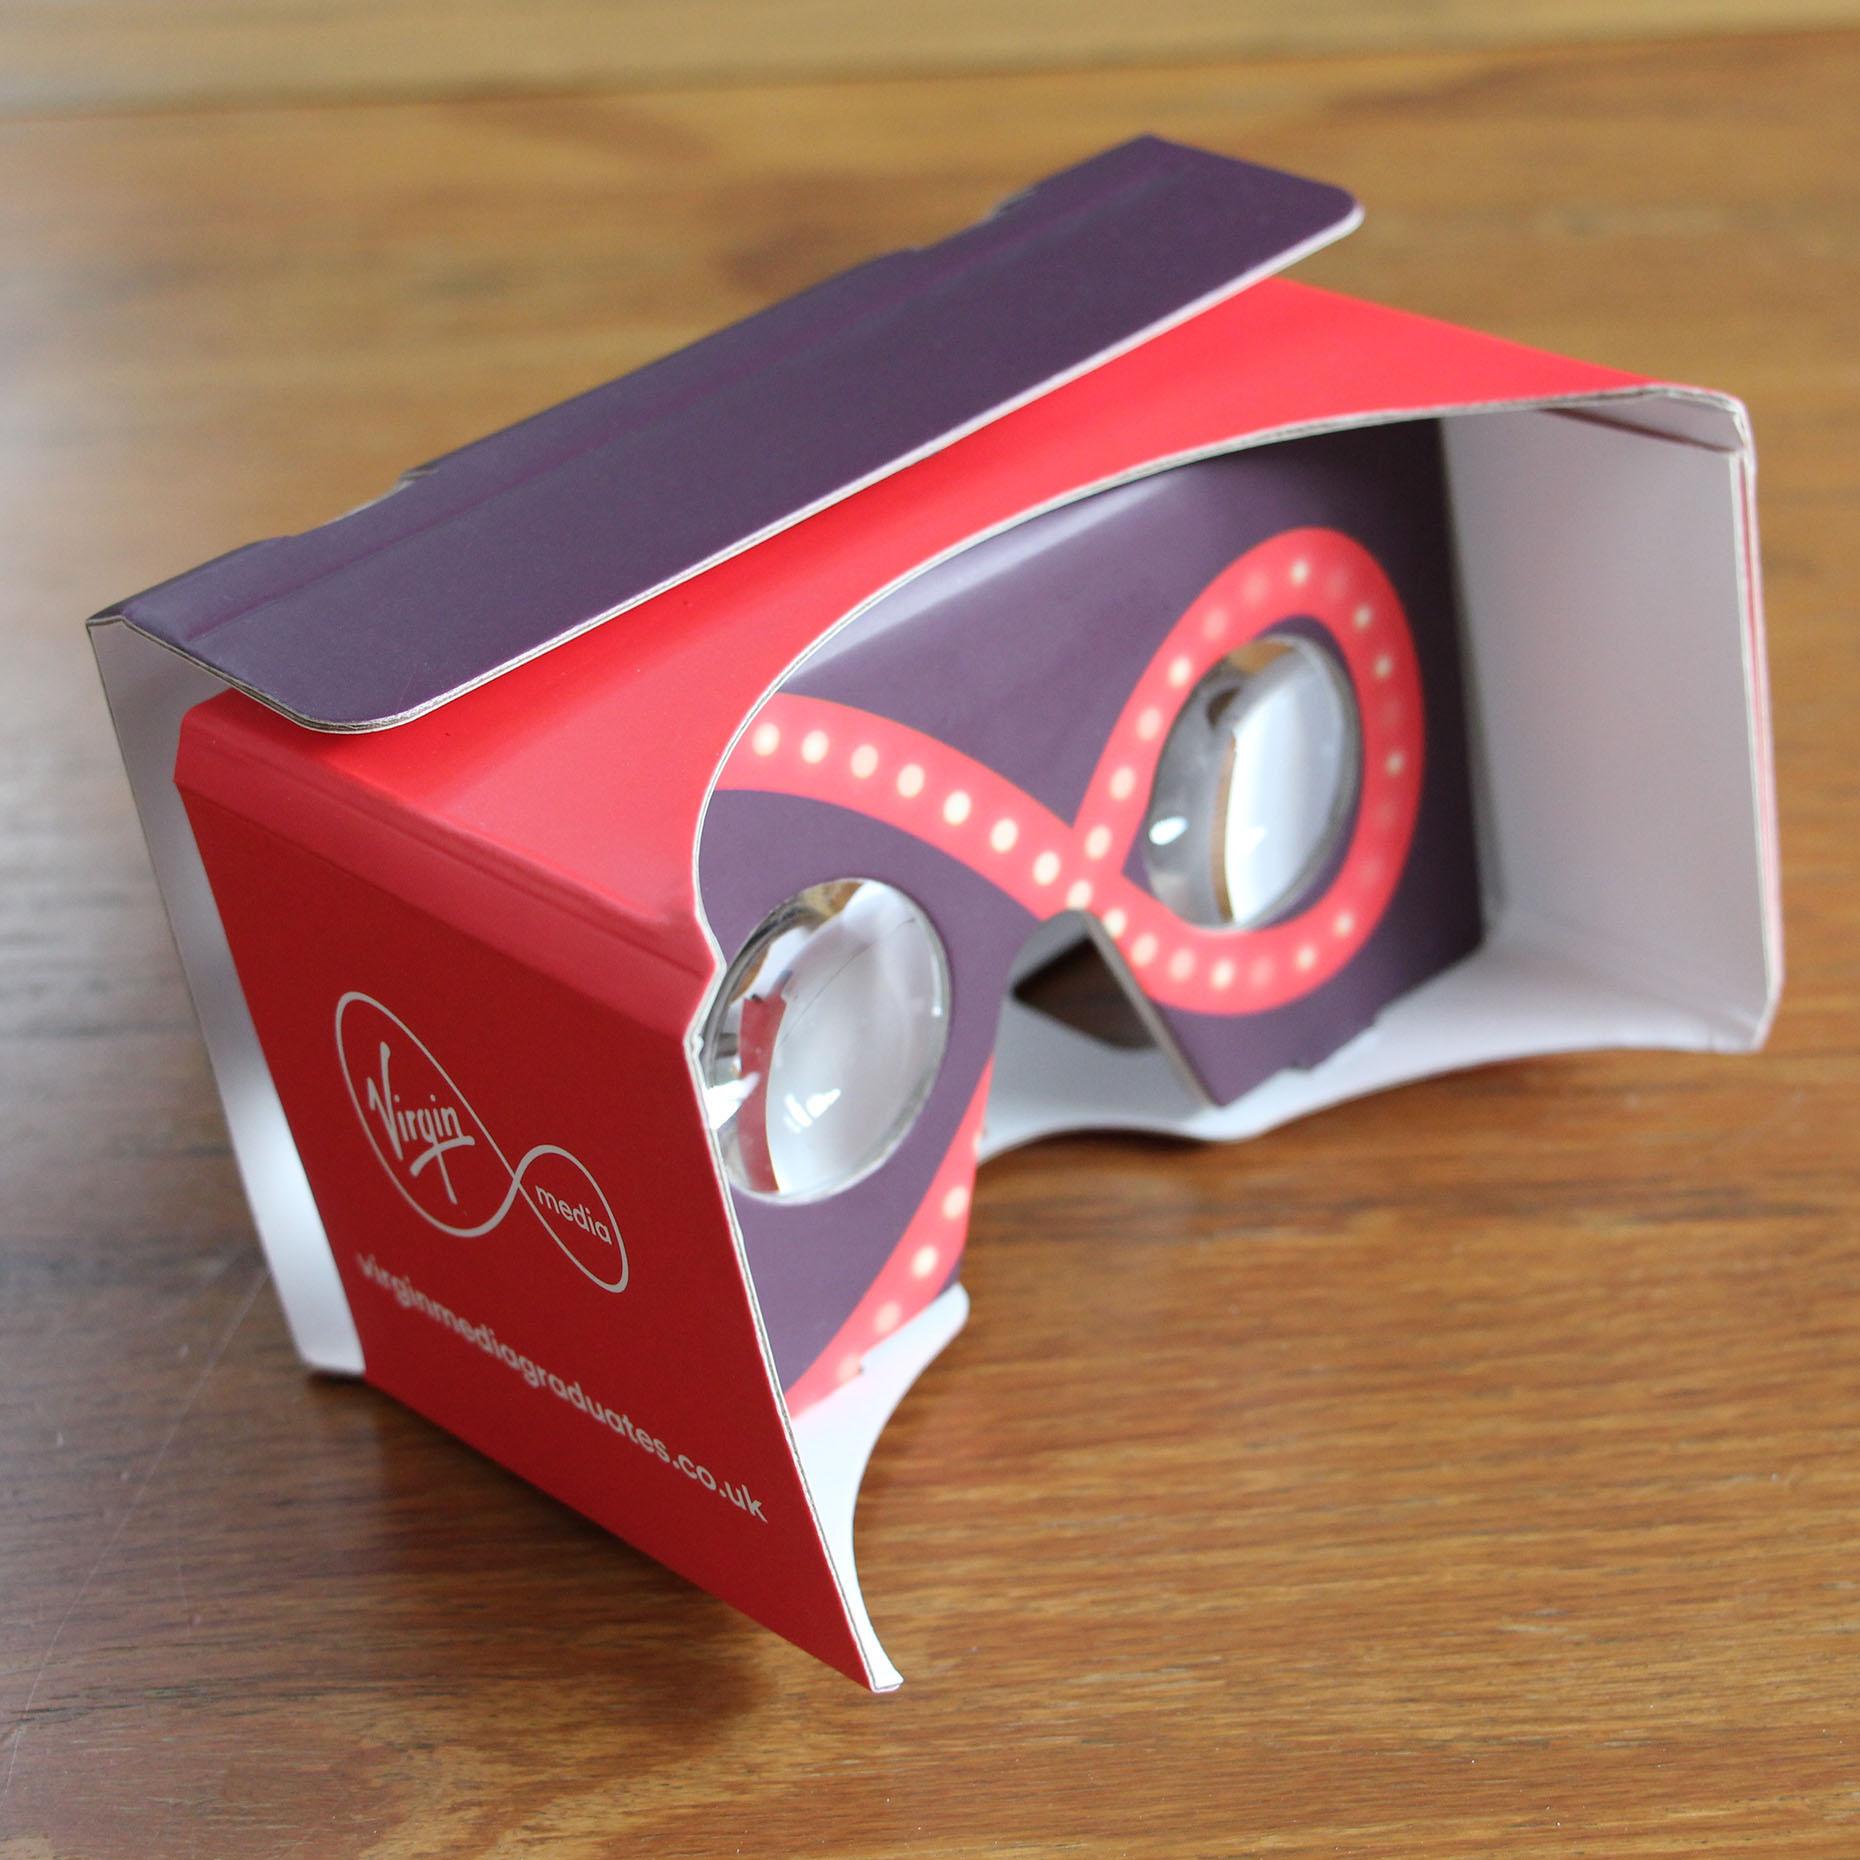 Virgin Media VR Goggles